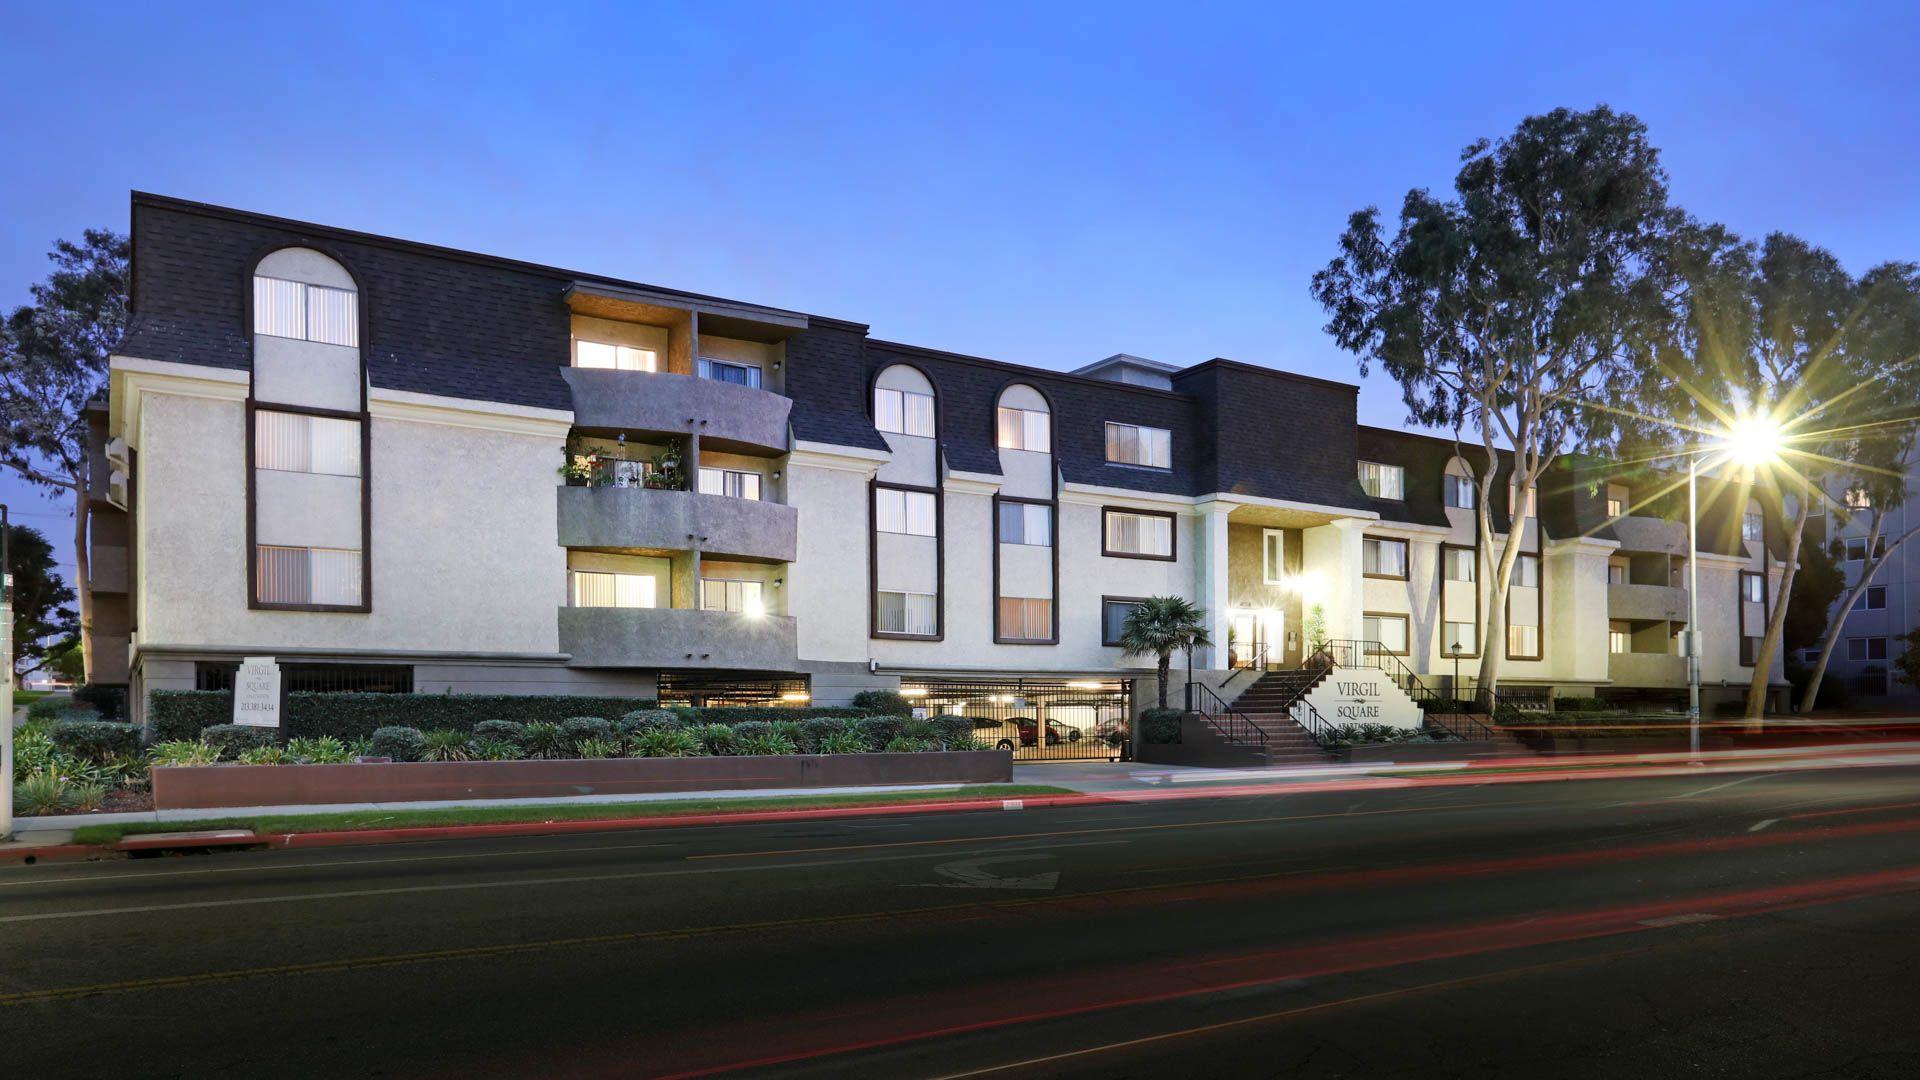 Virgil Square Apartments - Exterior